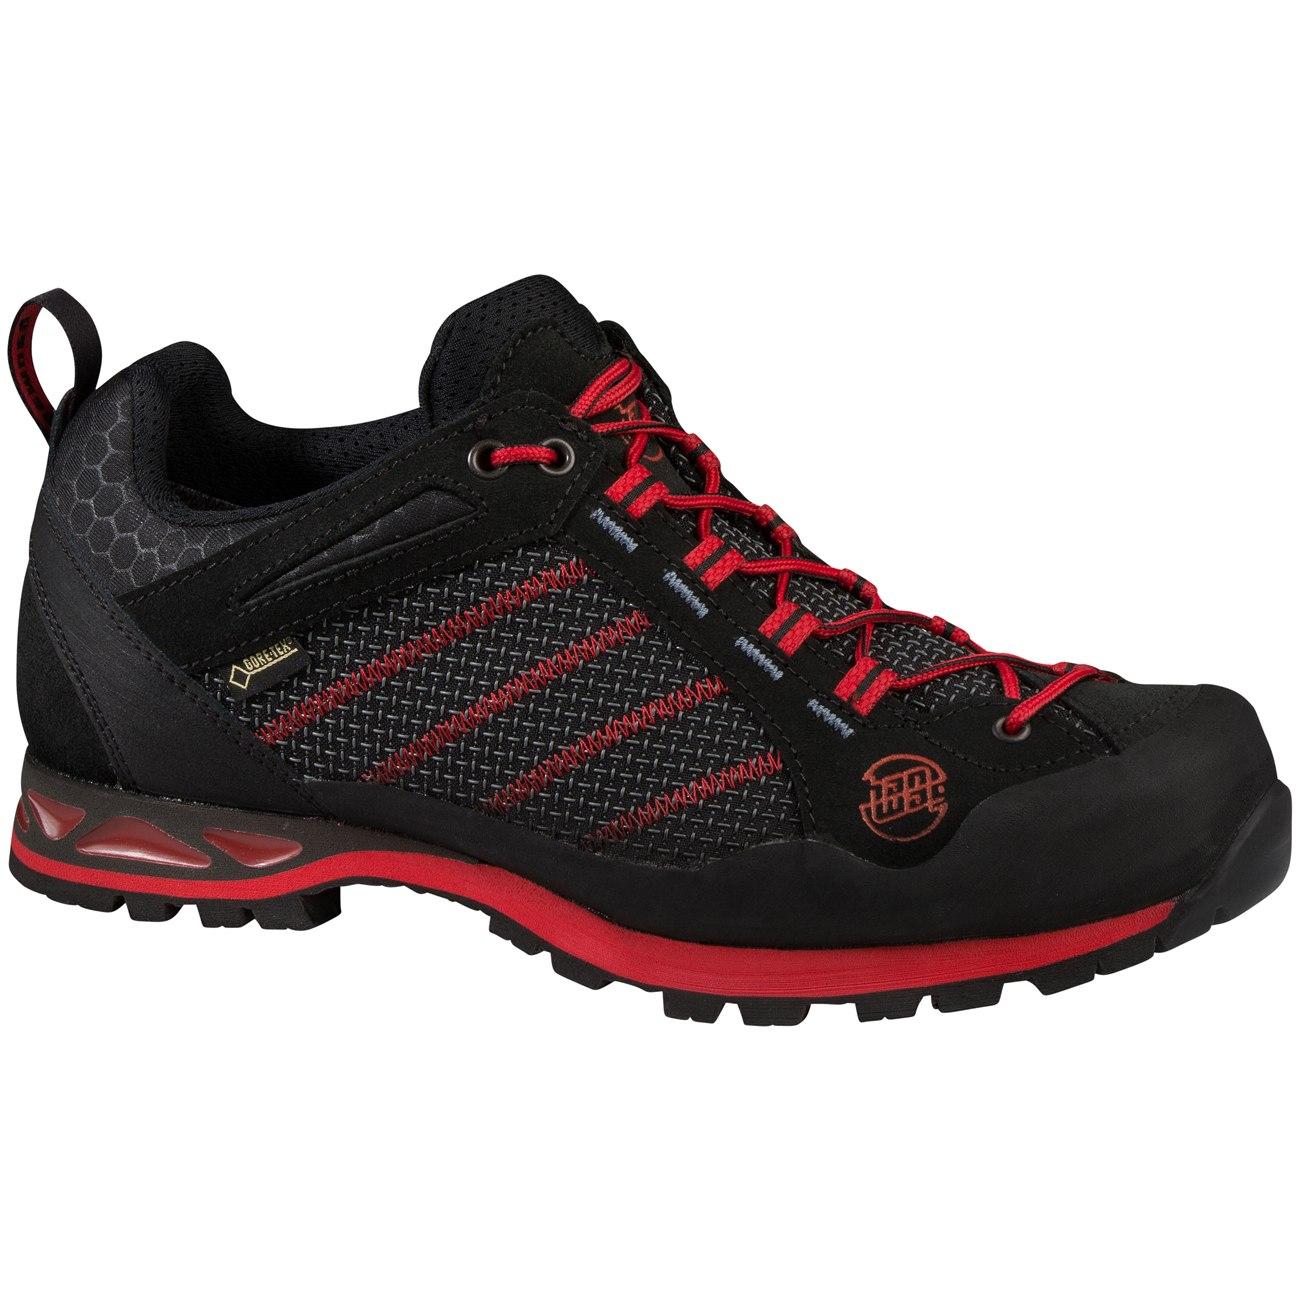 Hanwag Makra Low GTX Shoe - Black